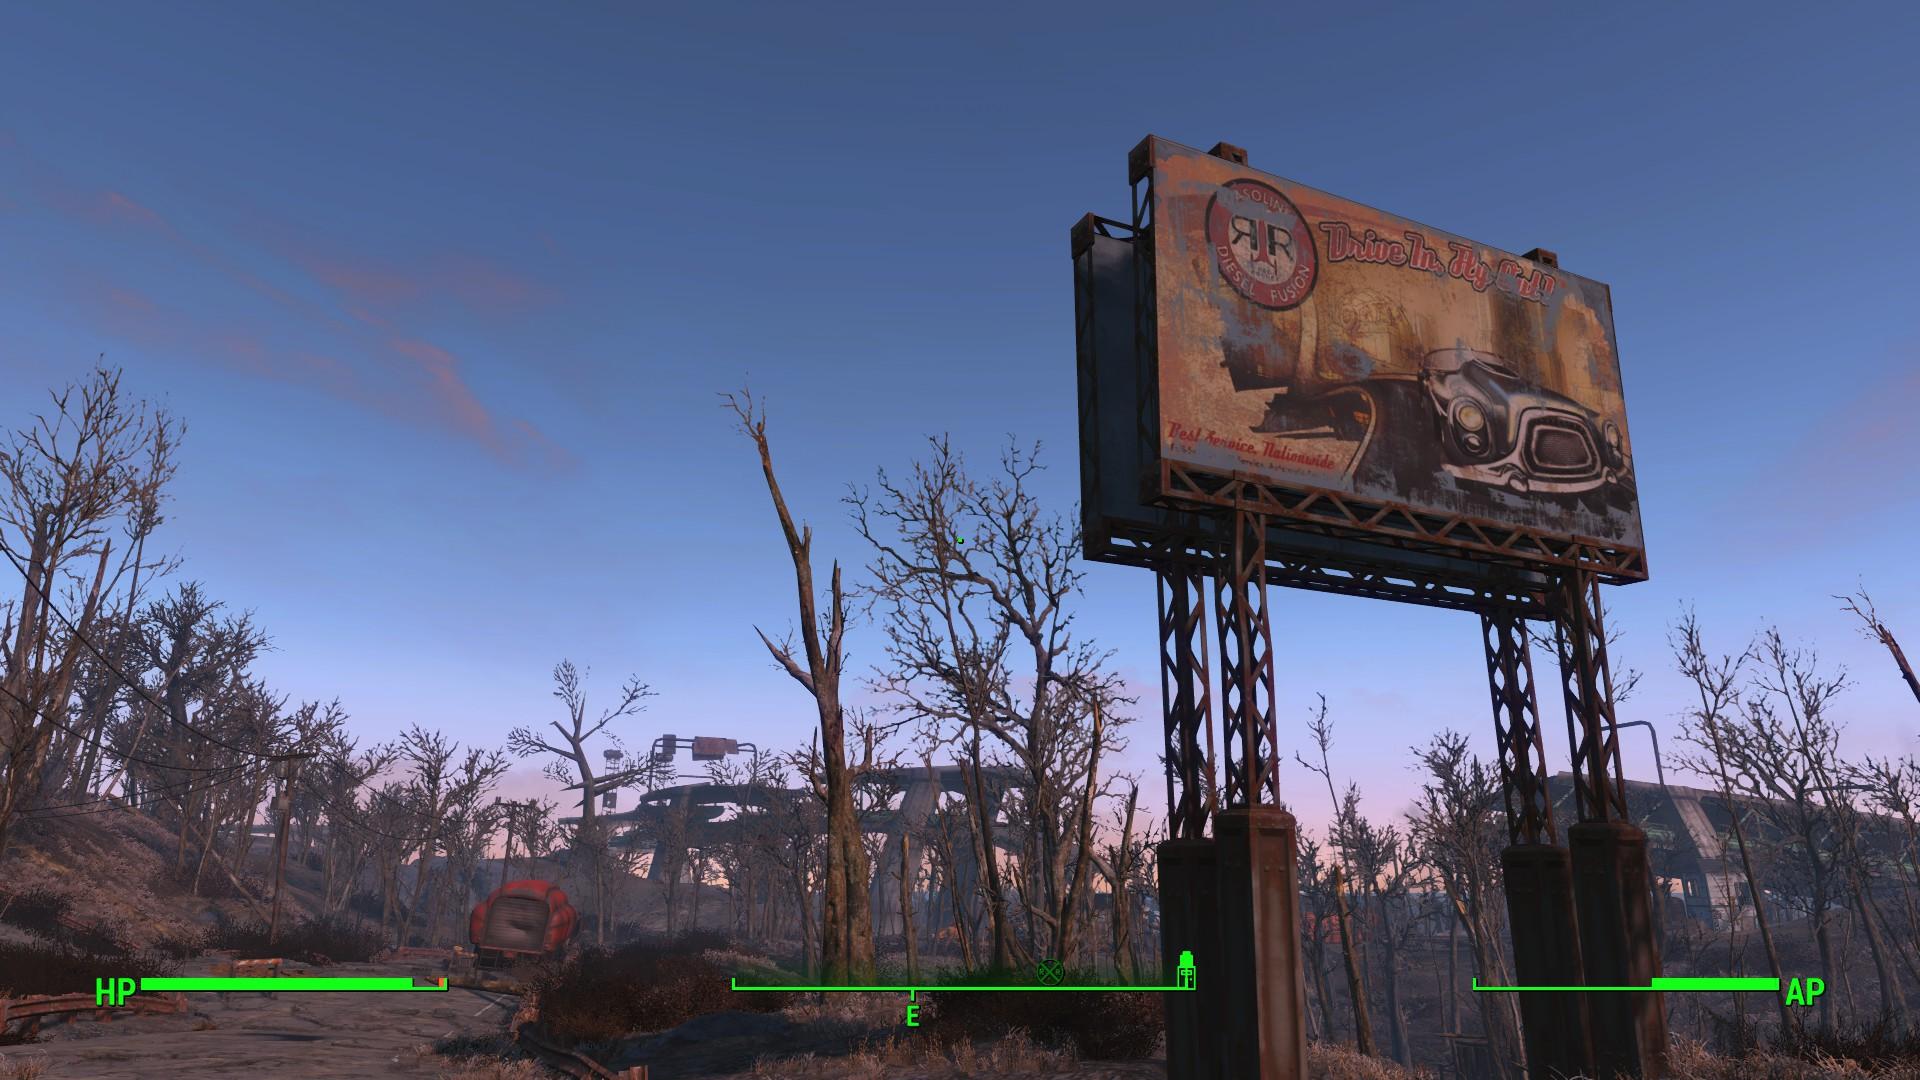 Fallout 4 se ve cinemático en consolas, es decir corre a menos de 30 cuadros por segundo